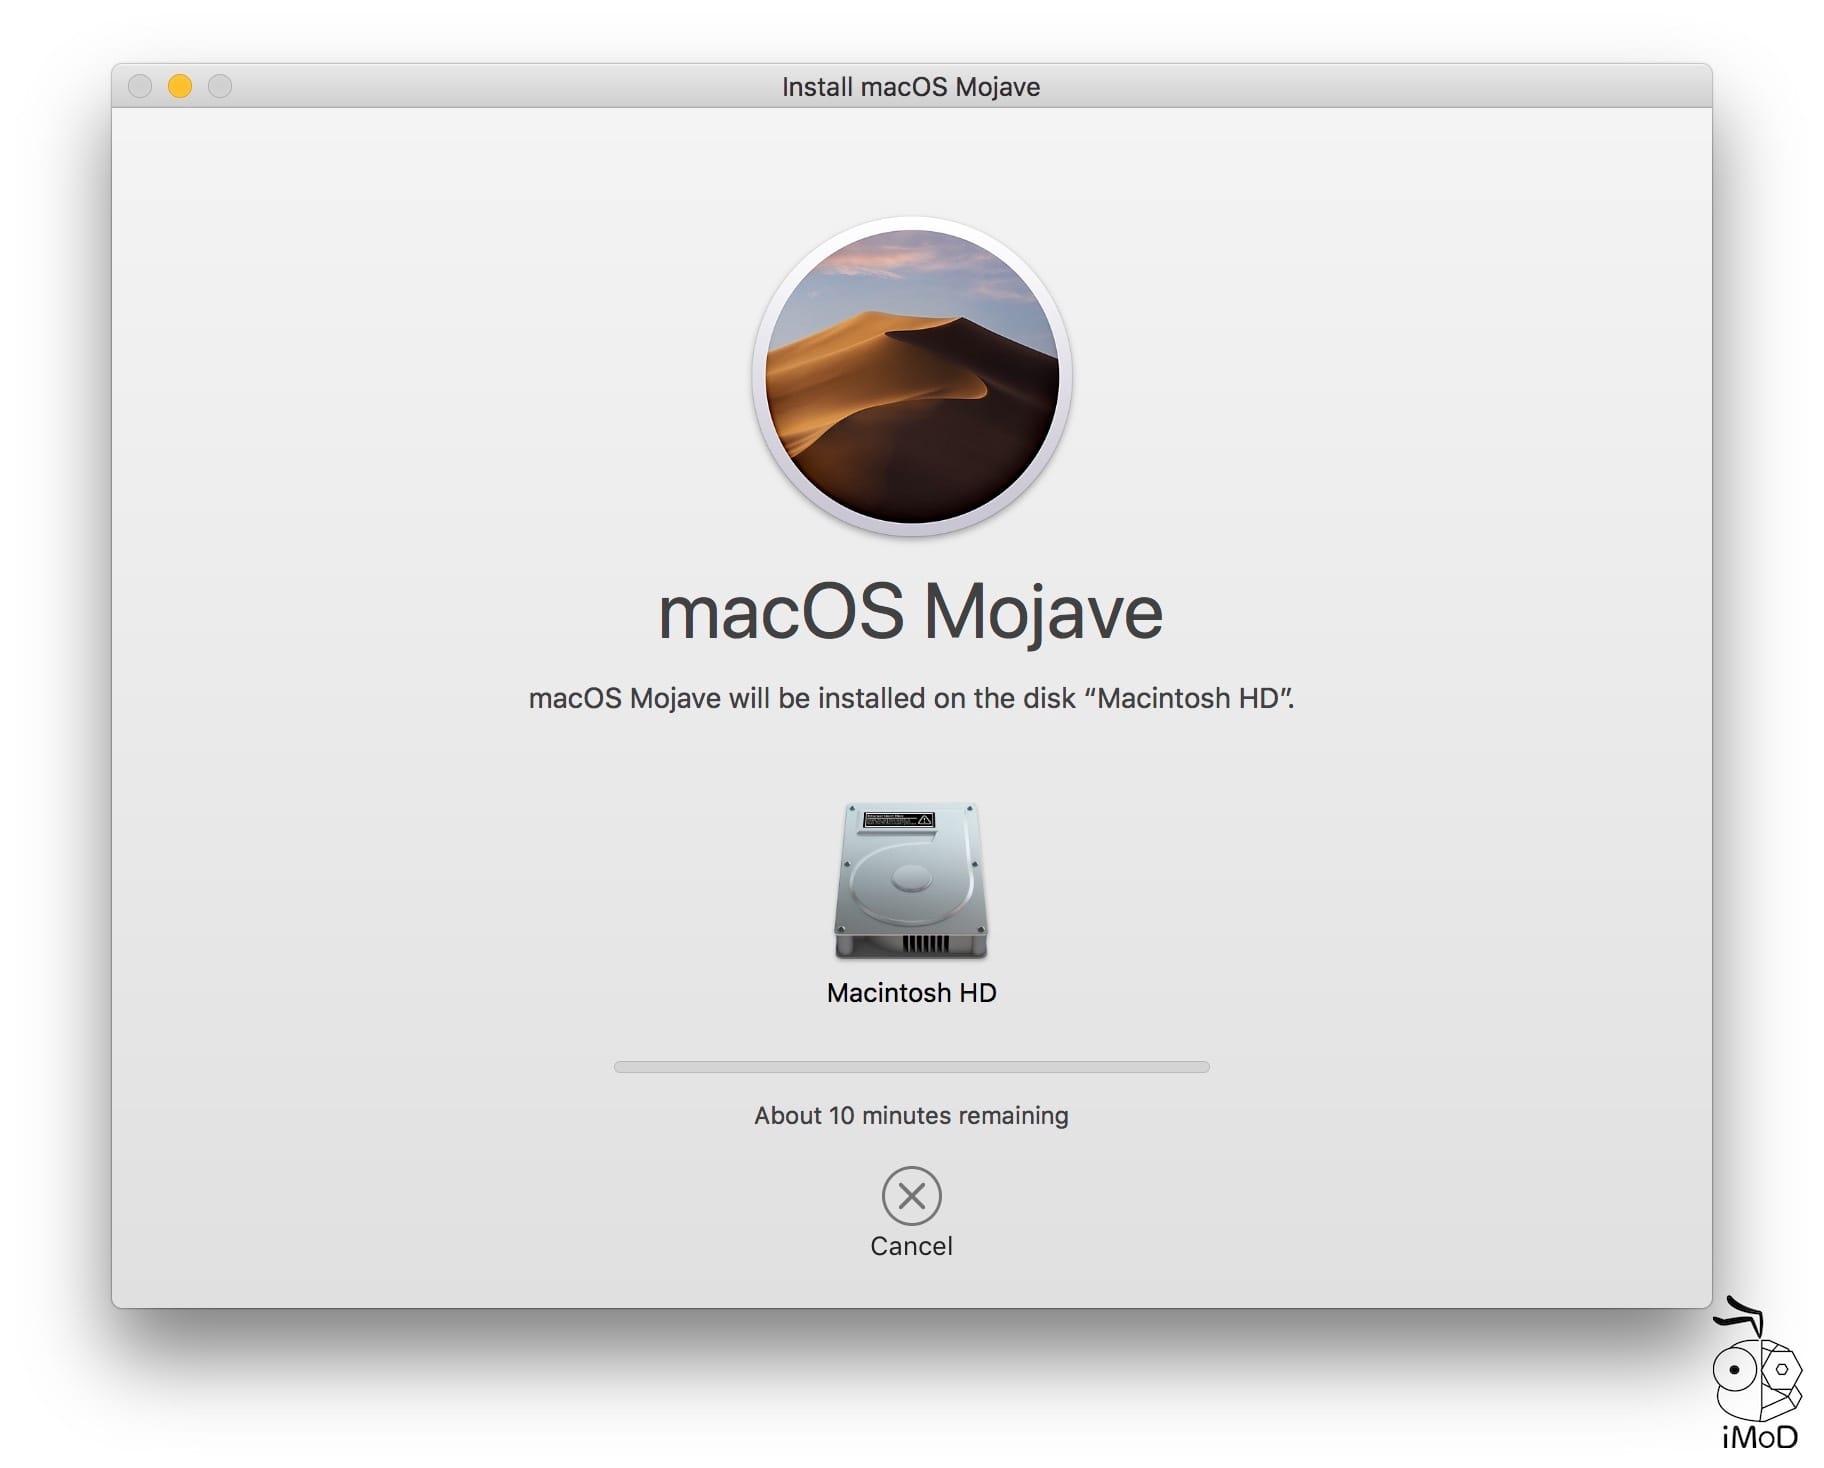 Install Macos Mojave Screenshot 2018 10 01 09.59.07